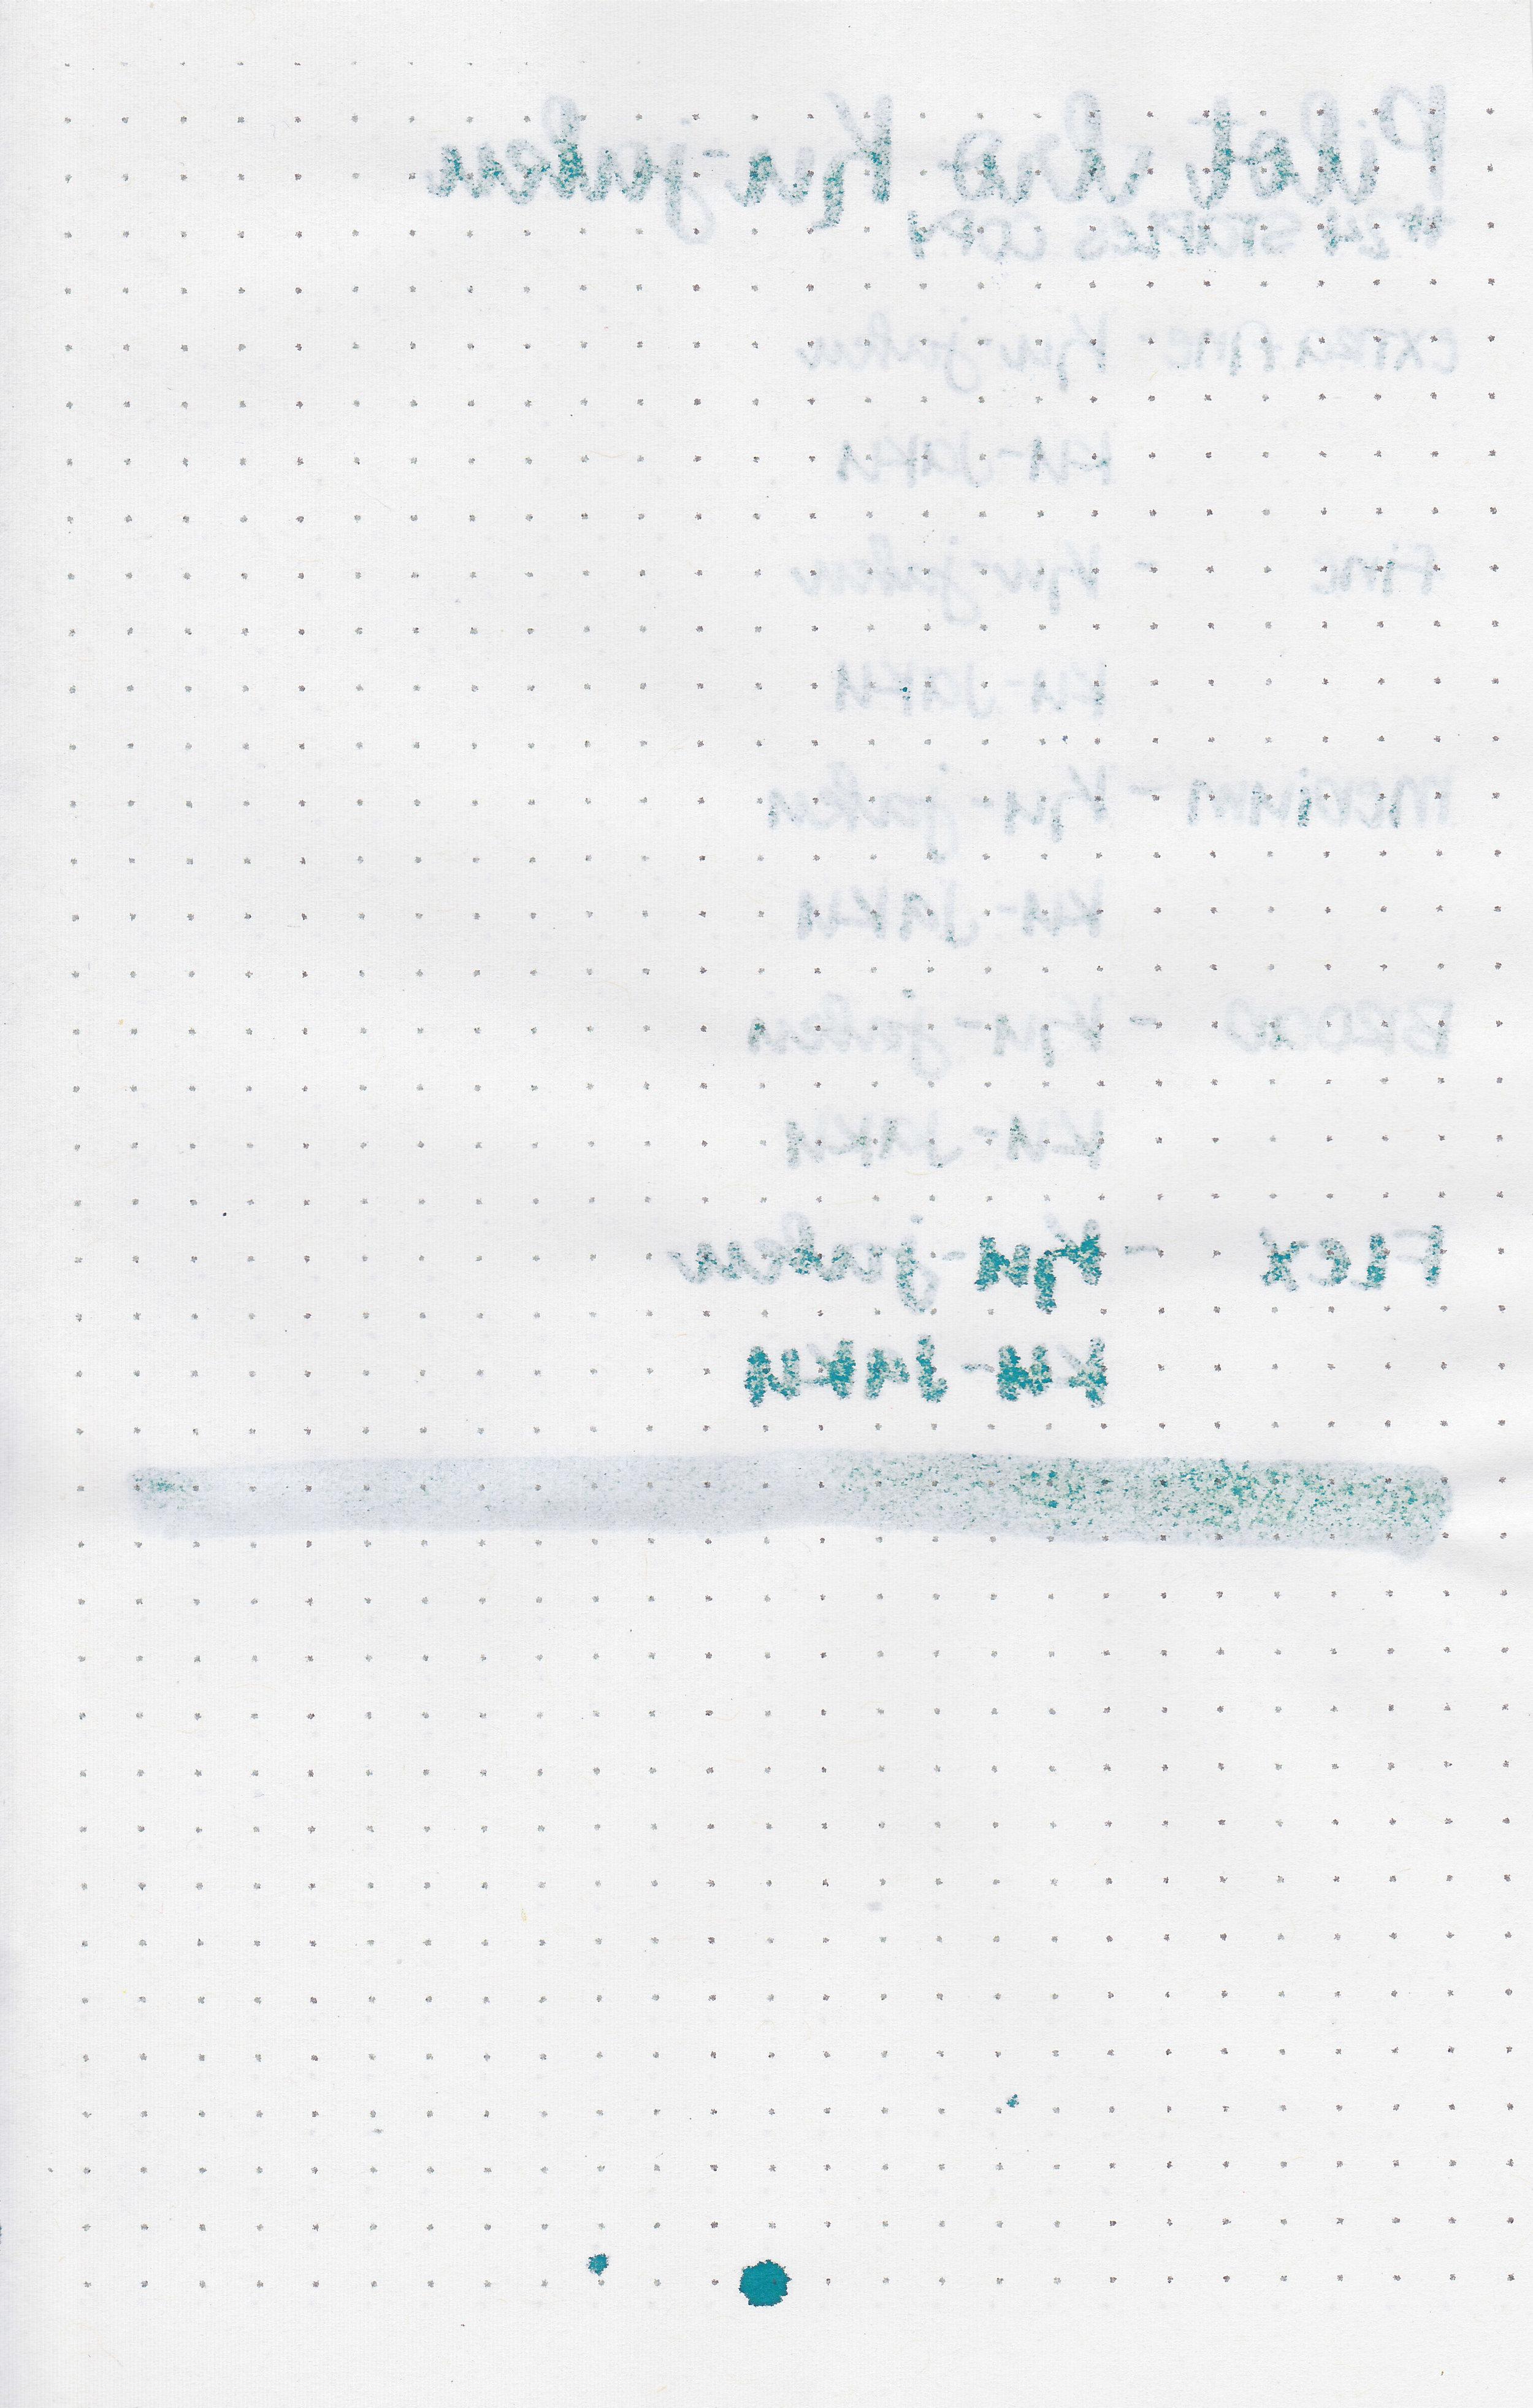 pi-ku-jaku-12.jpg